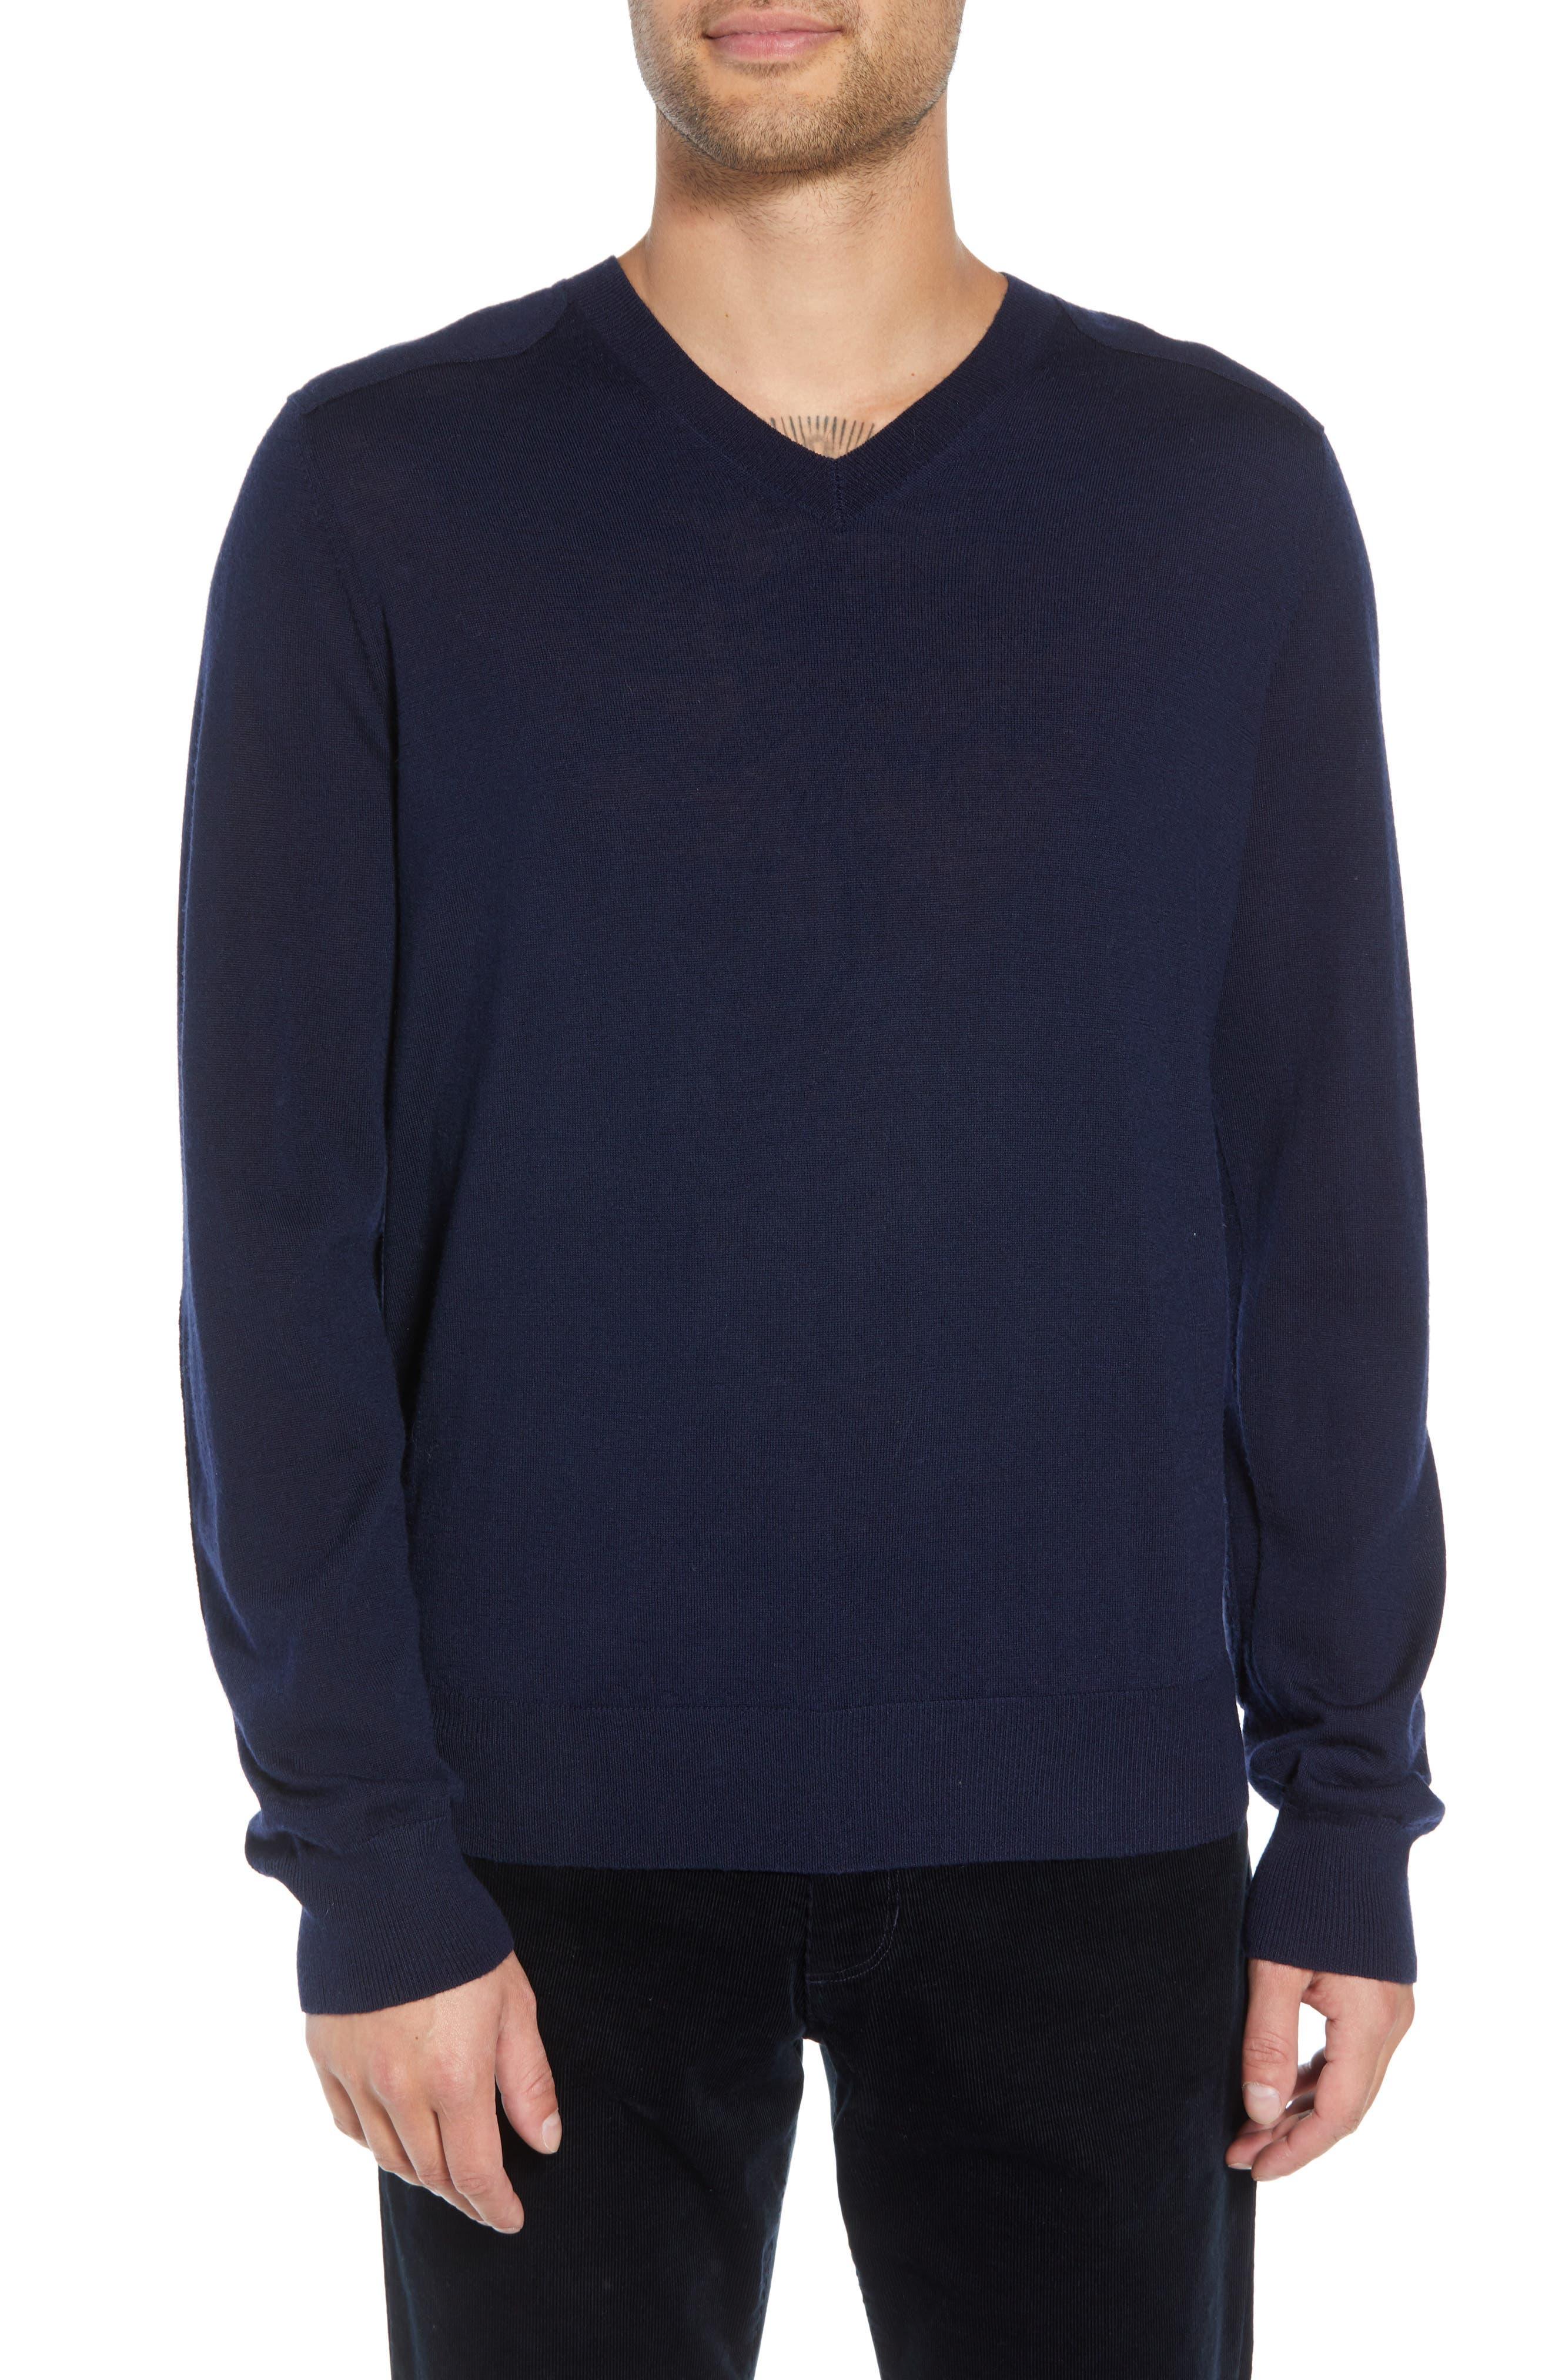 Vince Regular Fit Elbow Patch Merino Wool Sweater